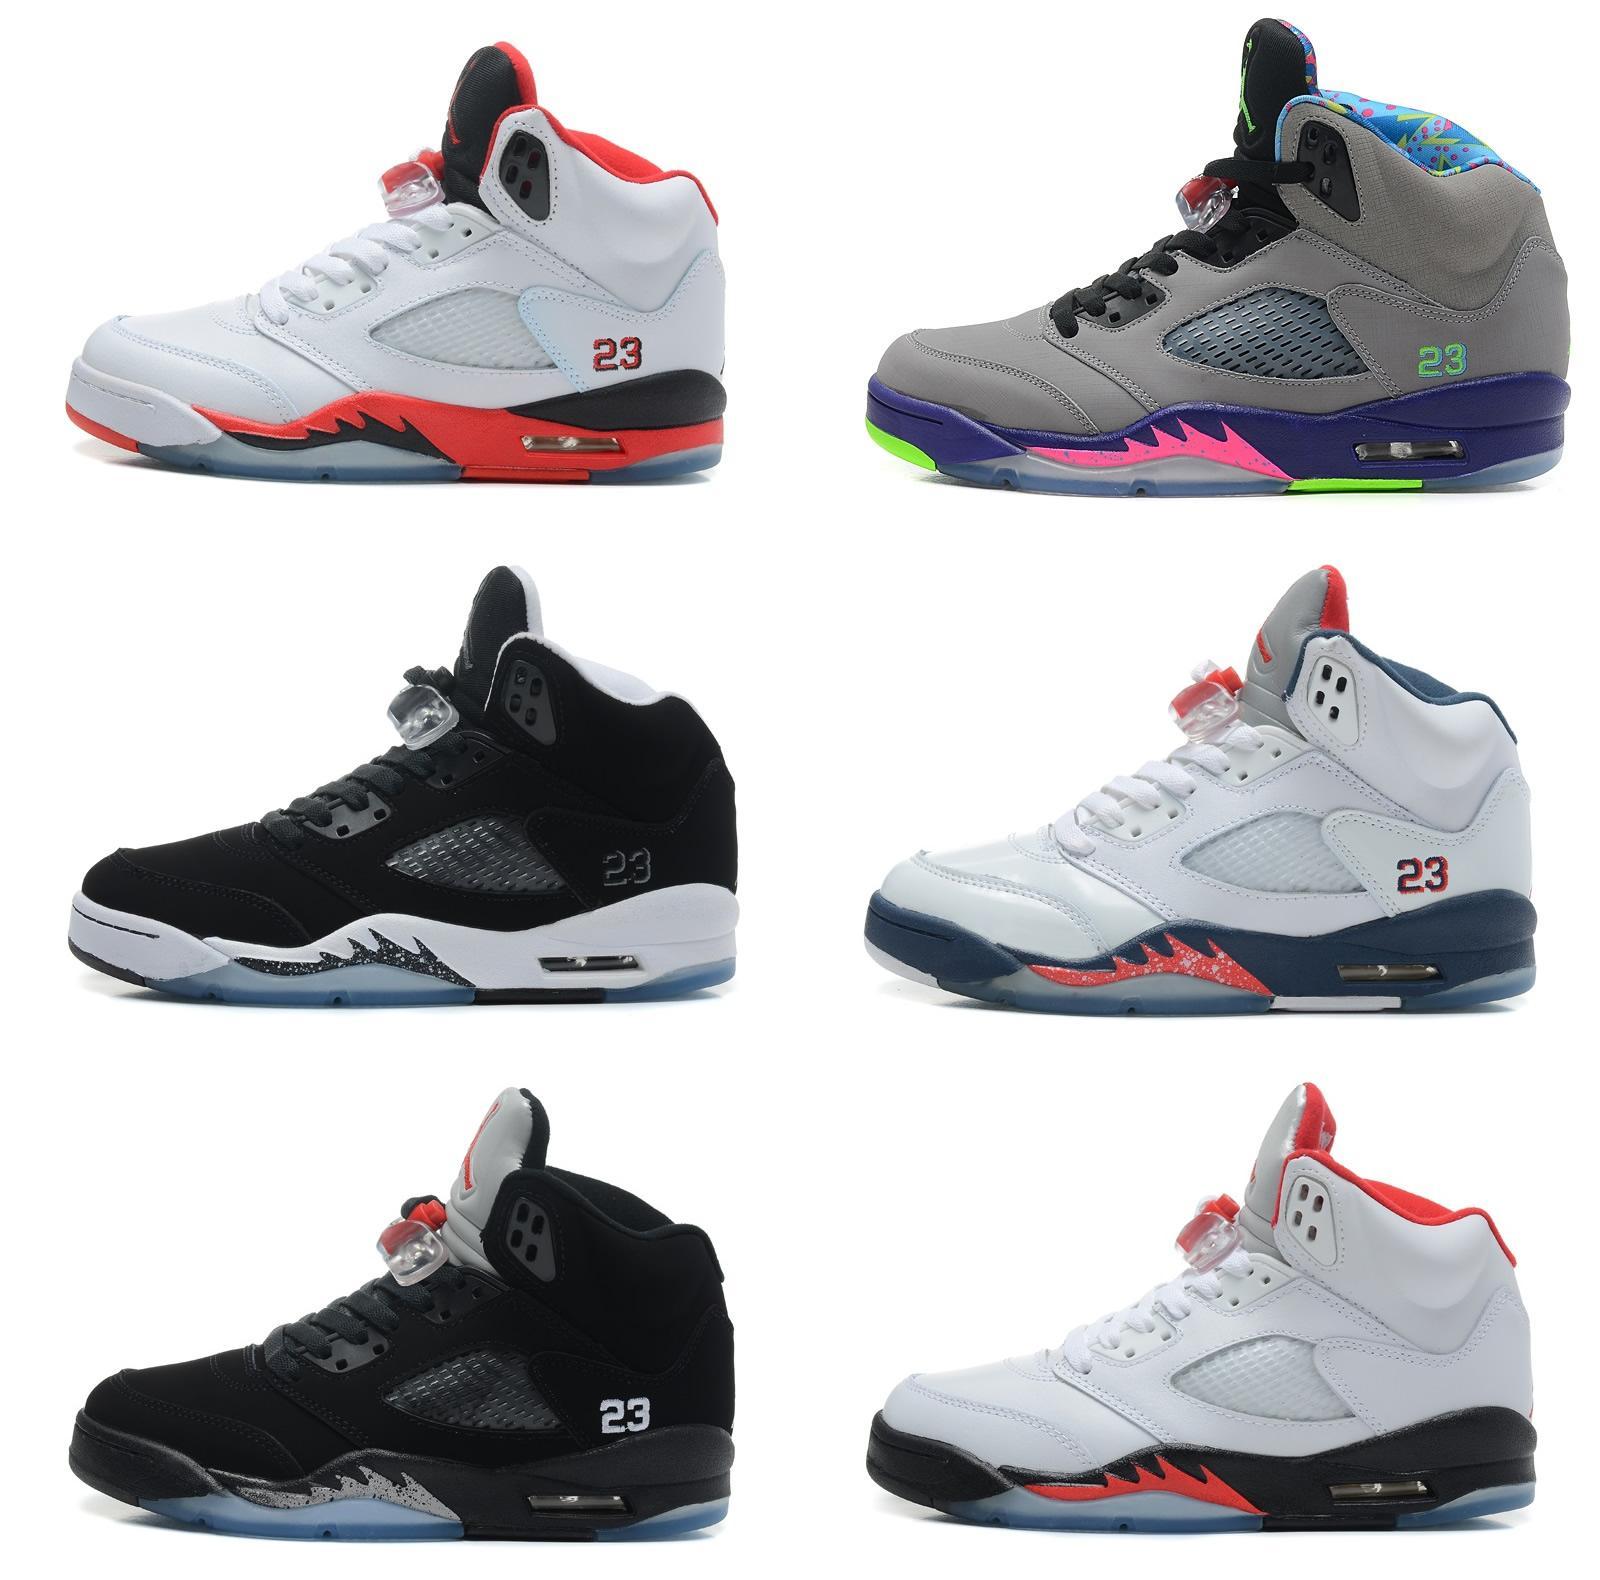 Jordan Fashions Clothing Wholesale